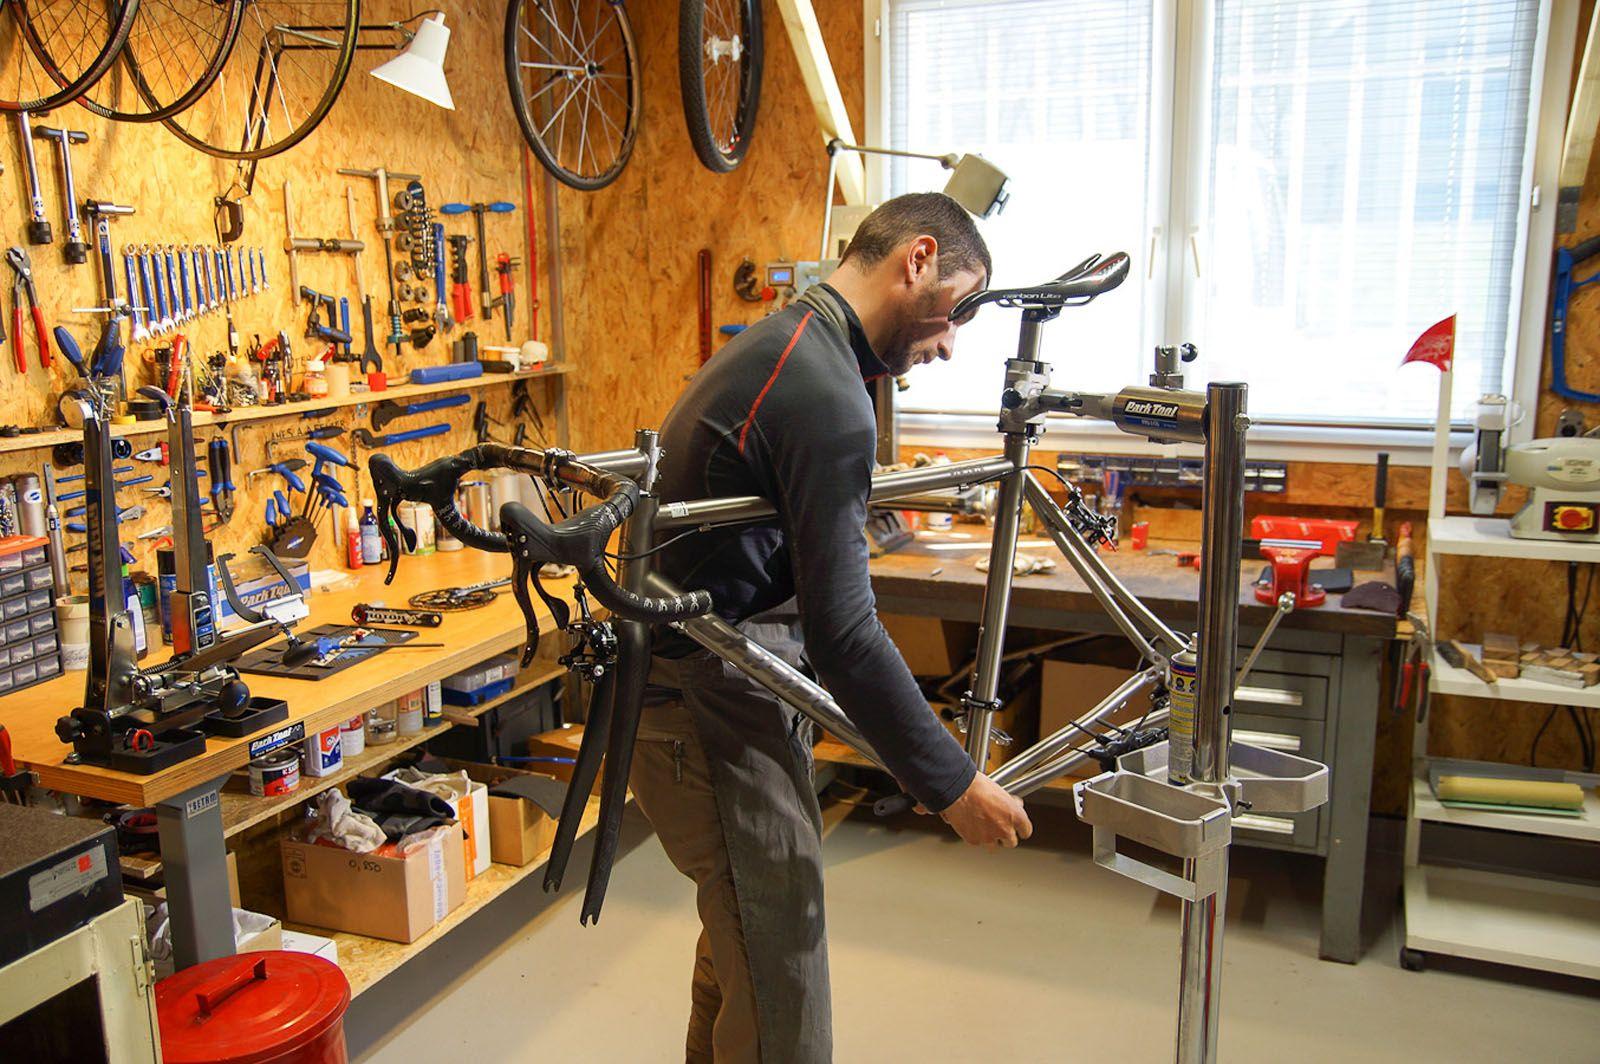 atelier titane entretien v lo roues bike shop ideas. Black Bedroom Furniture Sets. Home Design Ideas